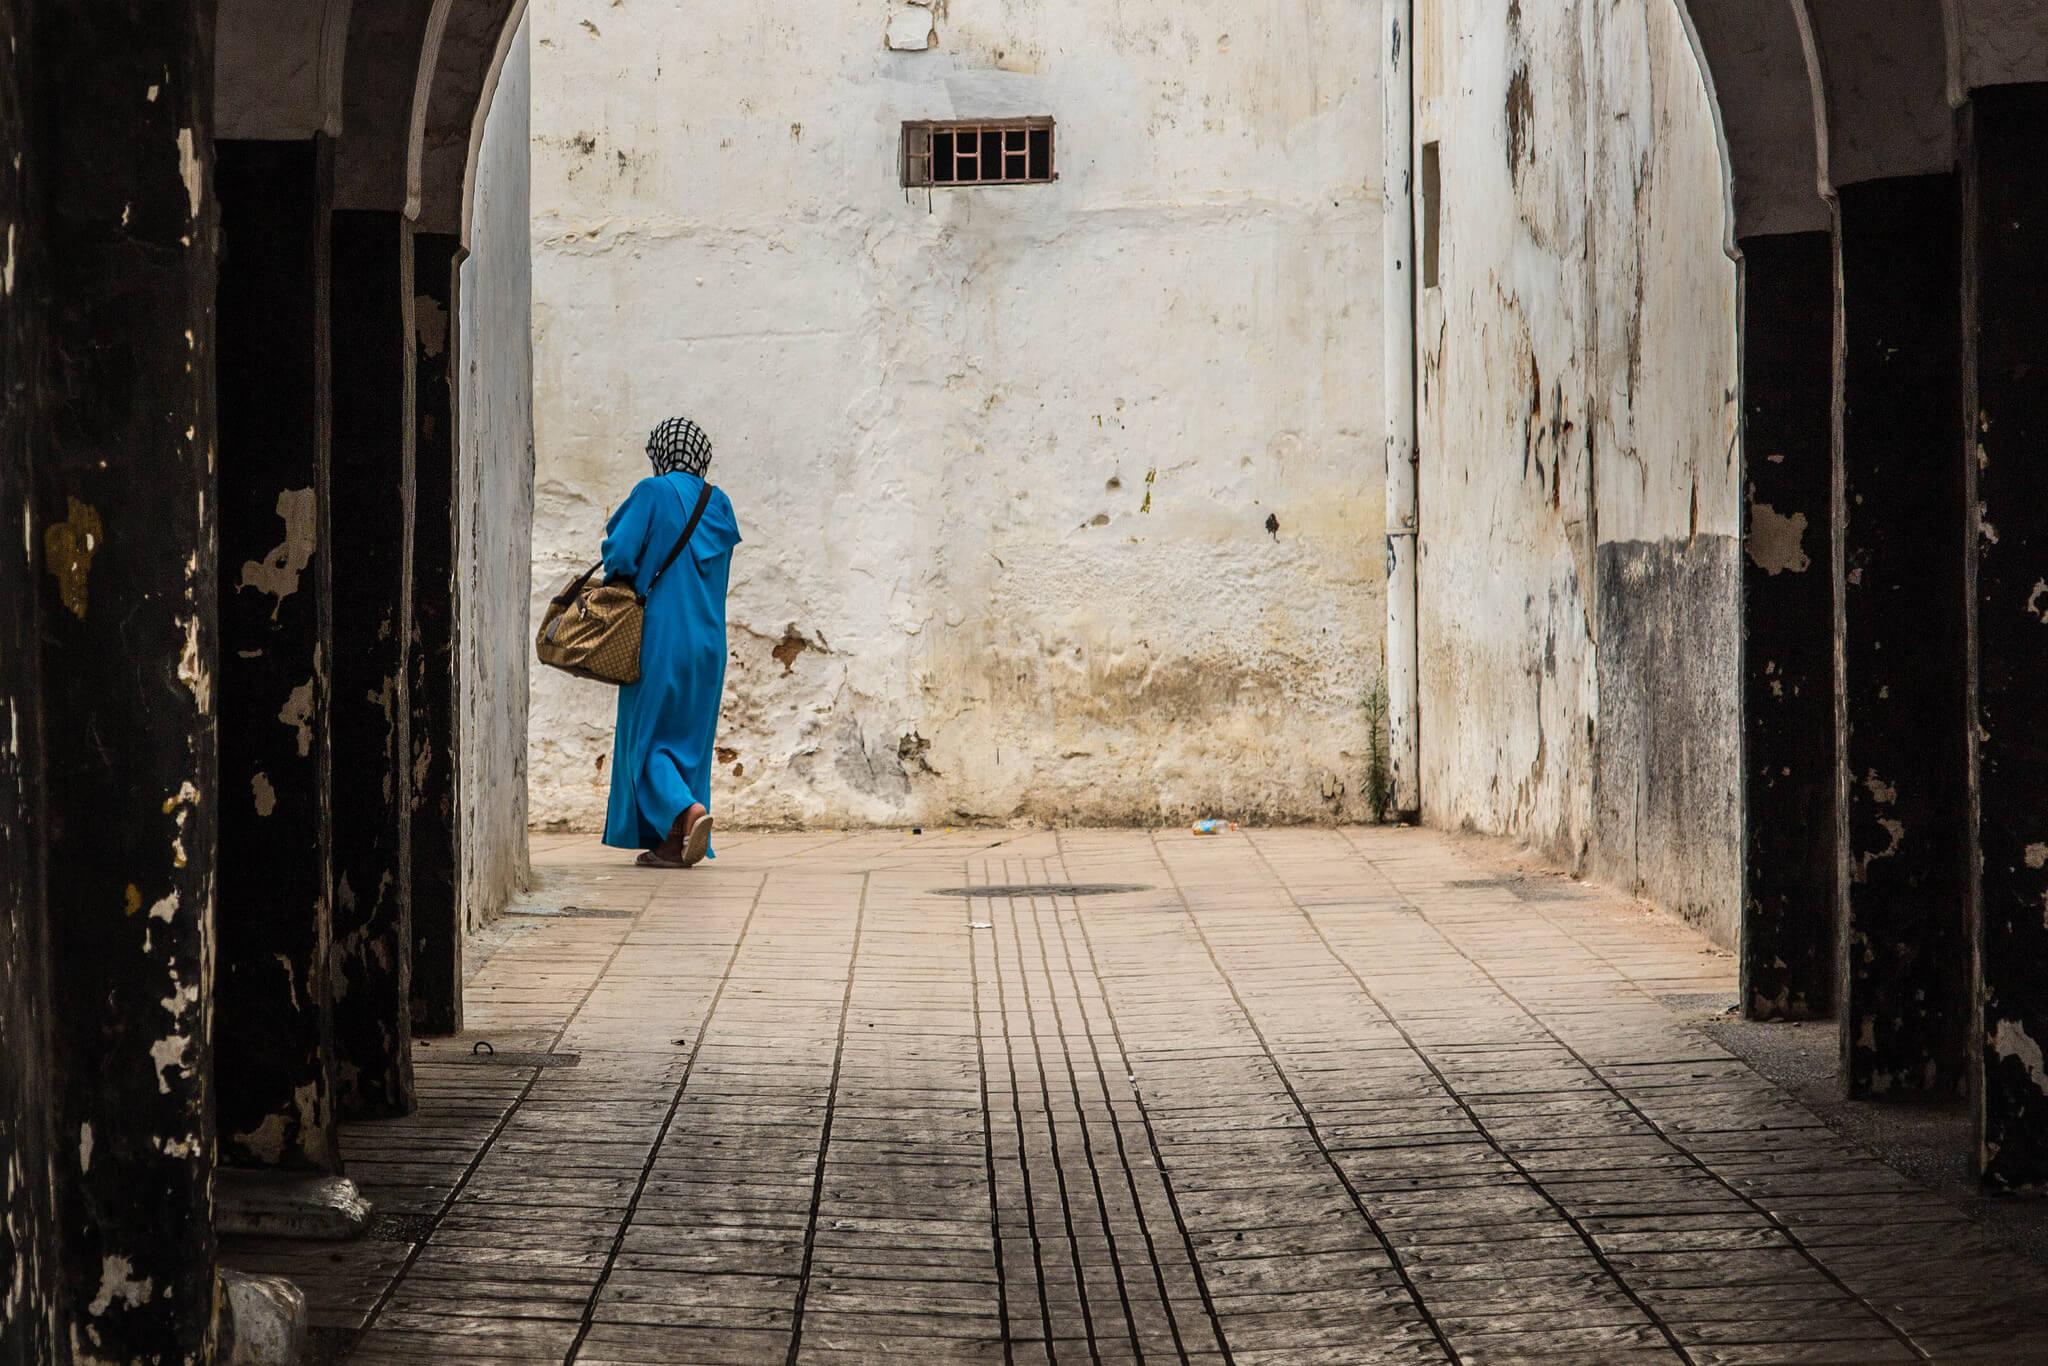 Необычные факты о Марокко